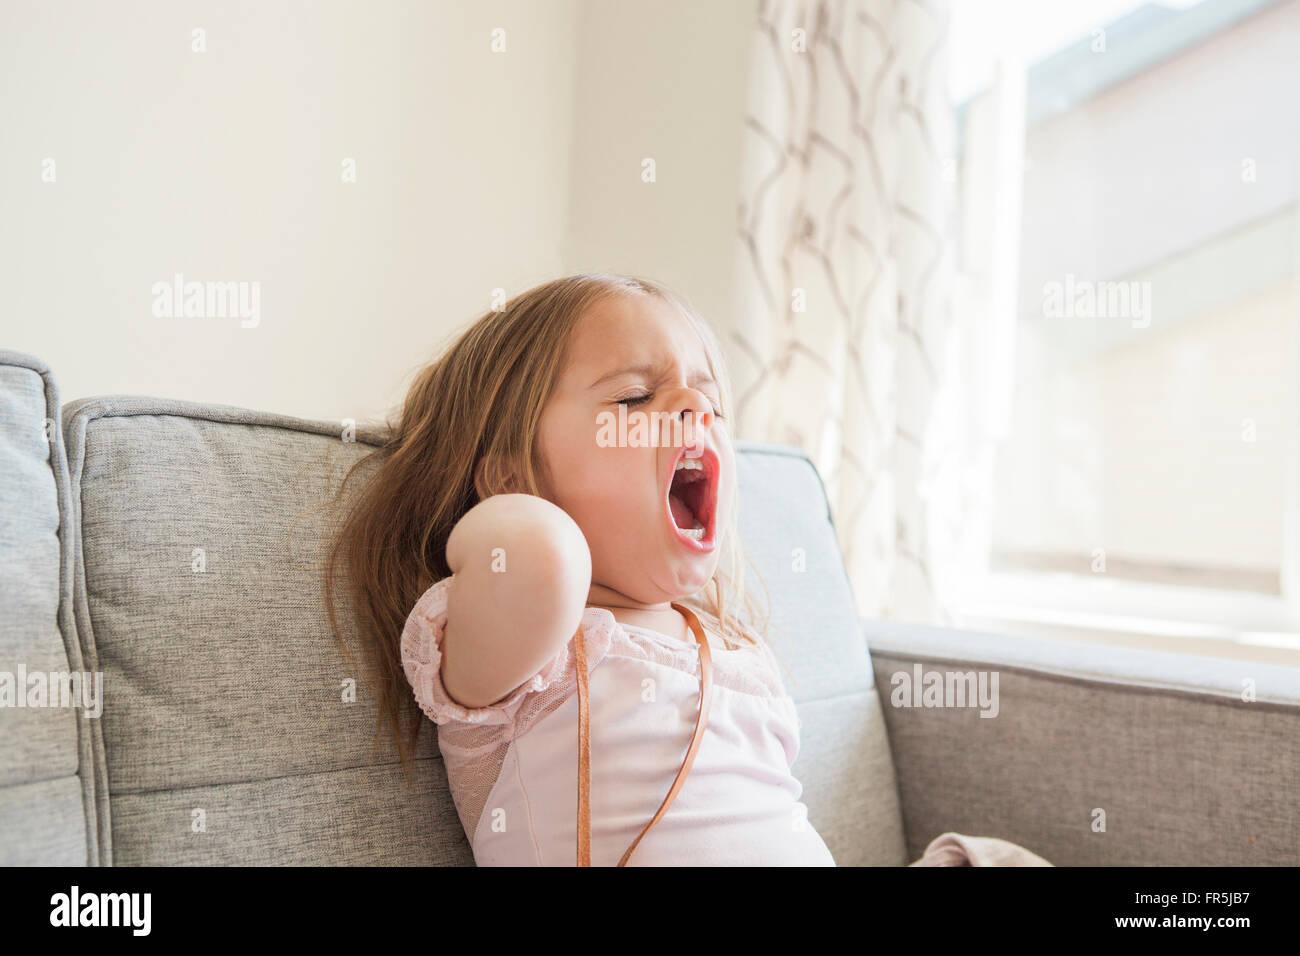 Toddler girl yawning on sofa - Stock Image